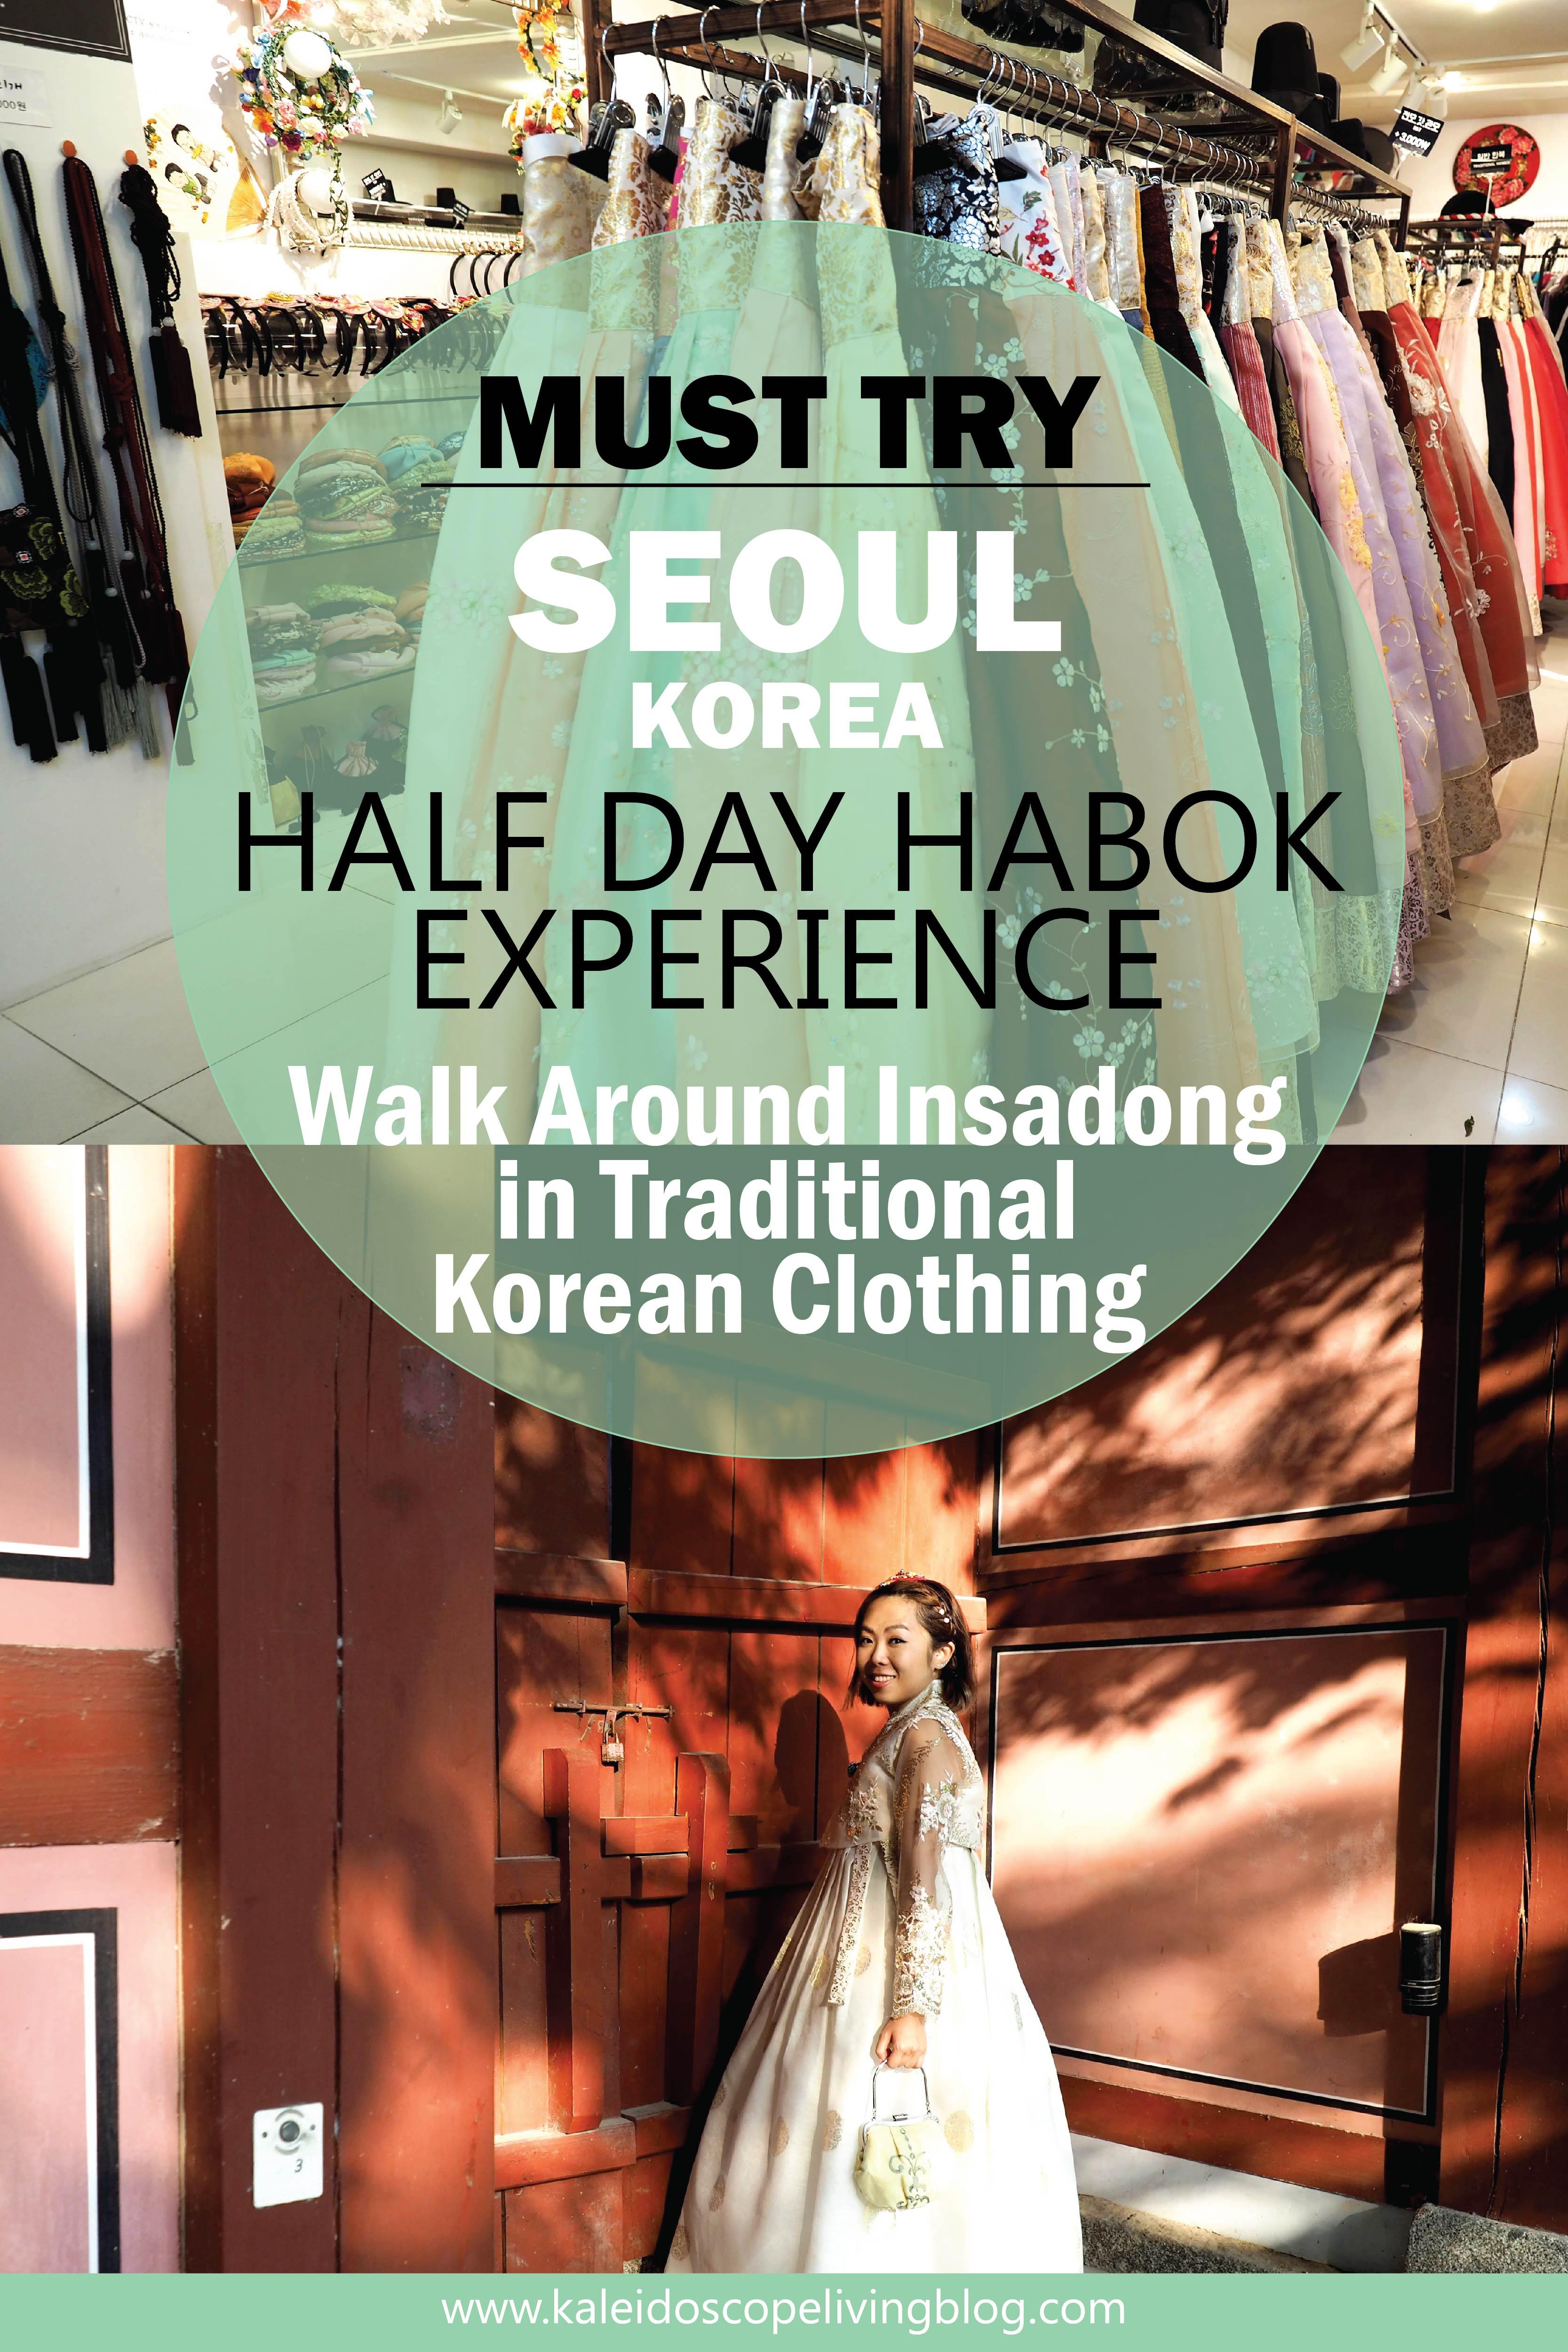 Travel_Korea_Seoul_Insadong_Habok_韓國_首爾_韓服